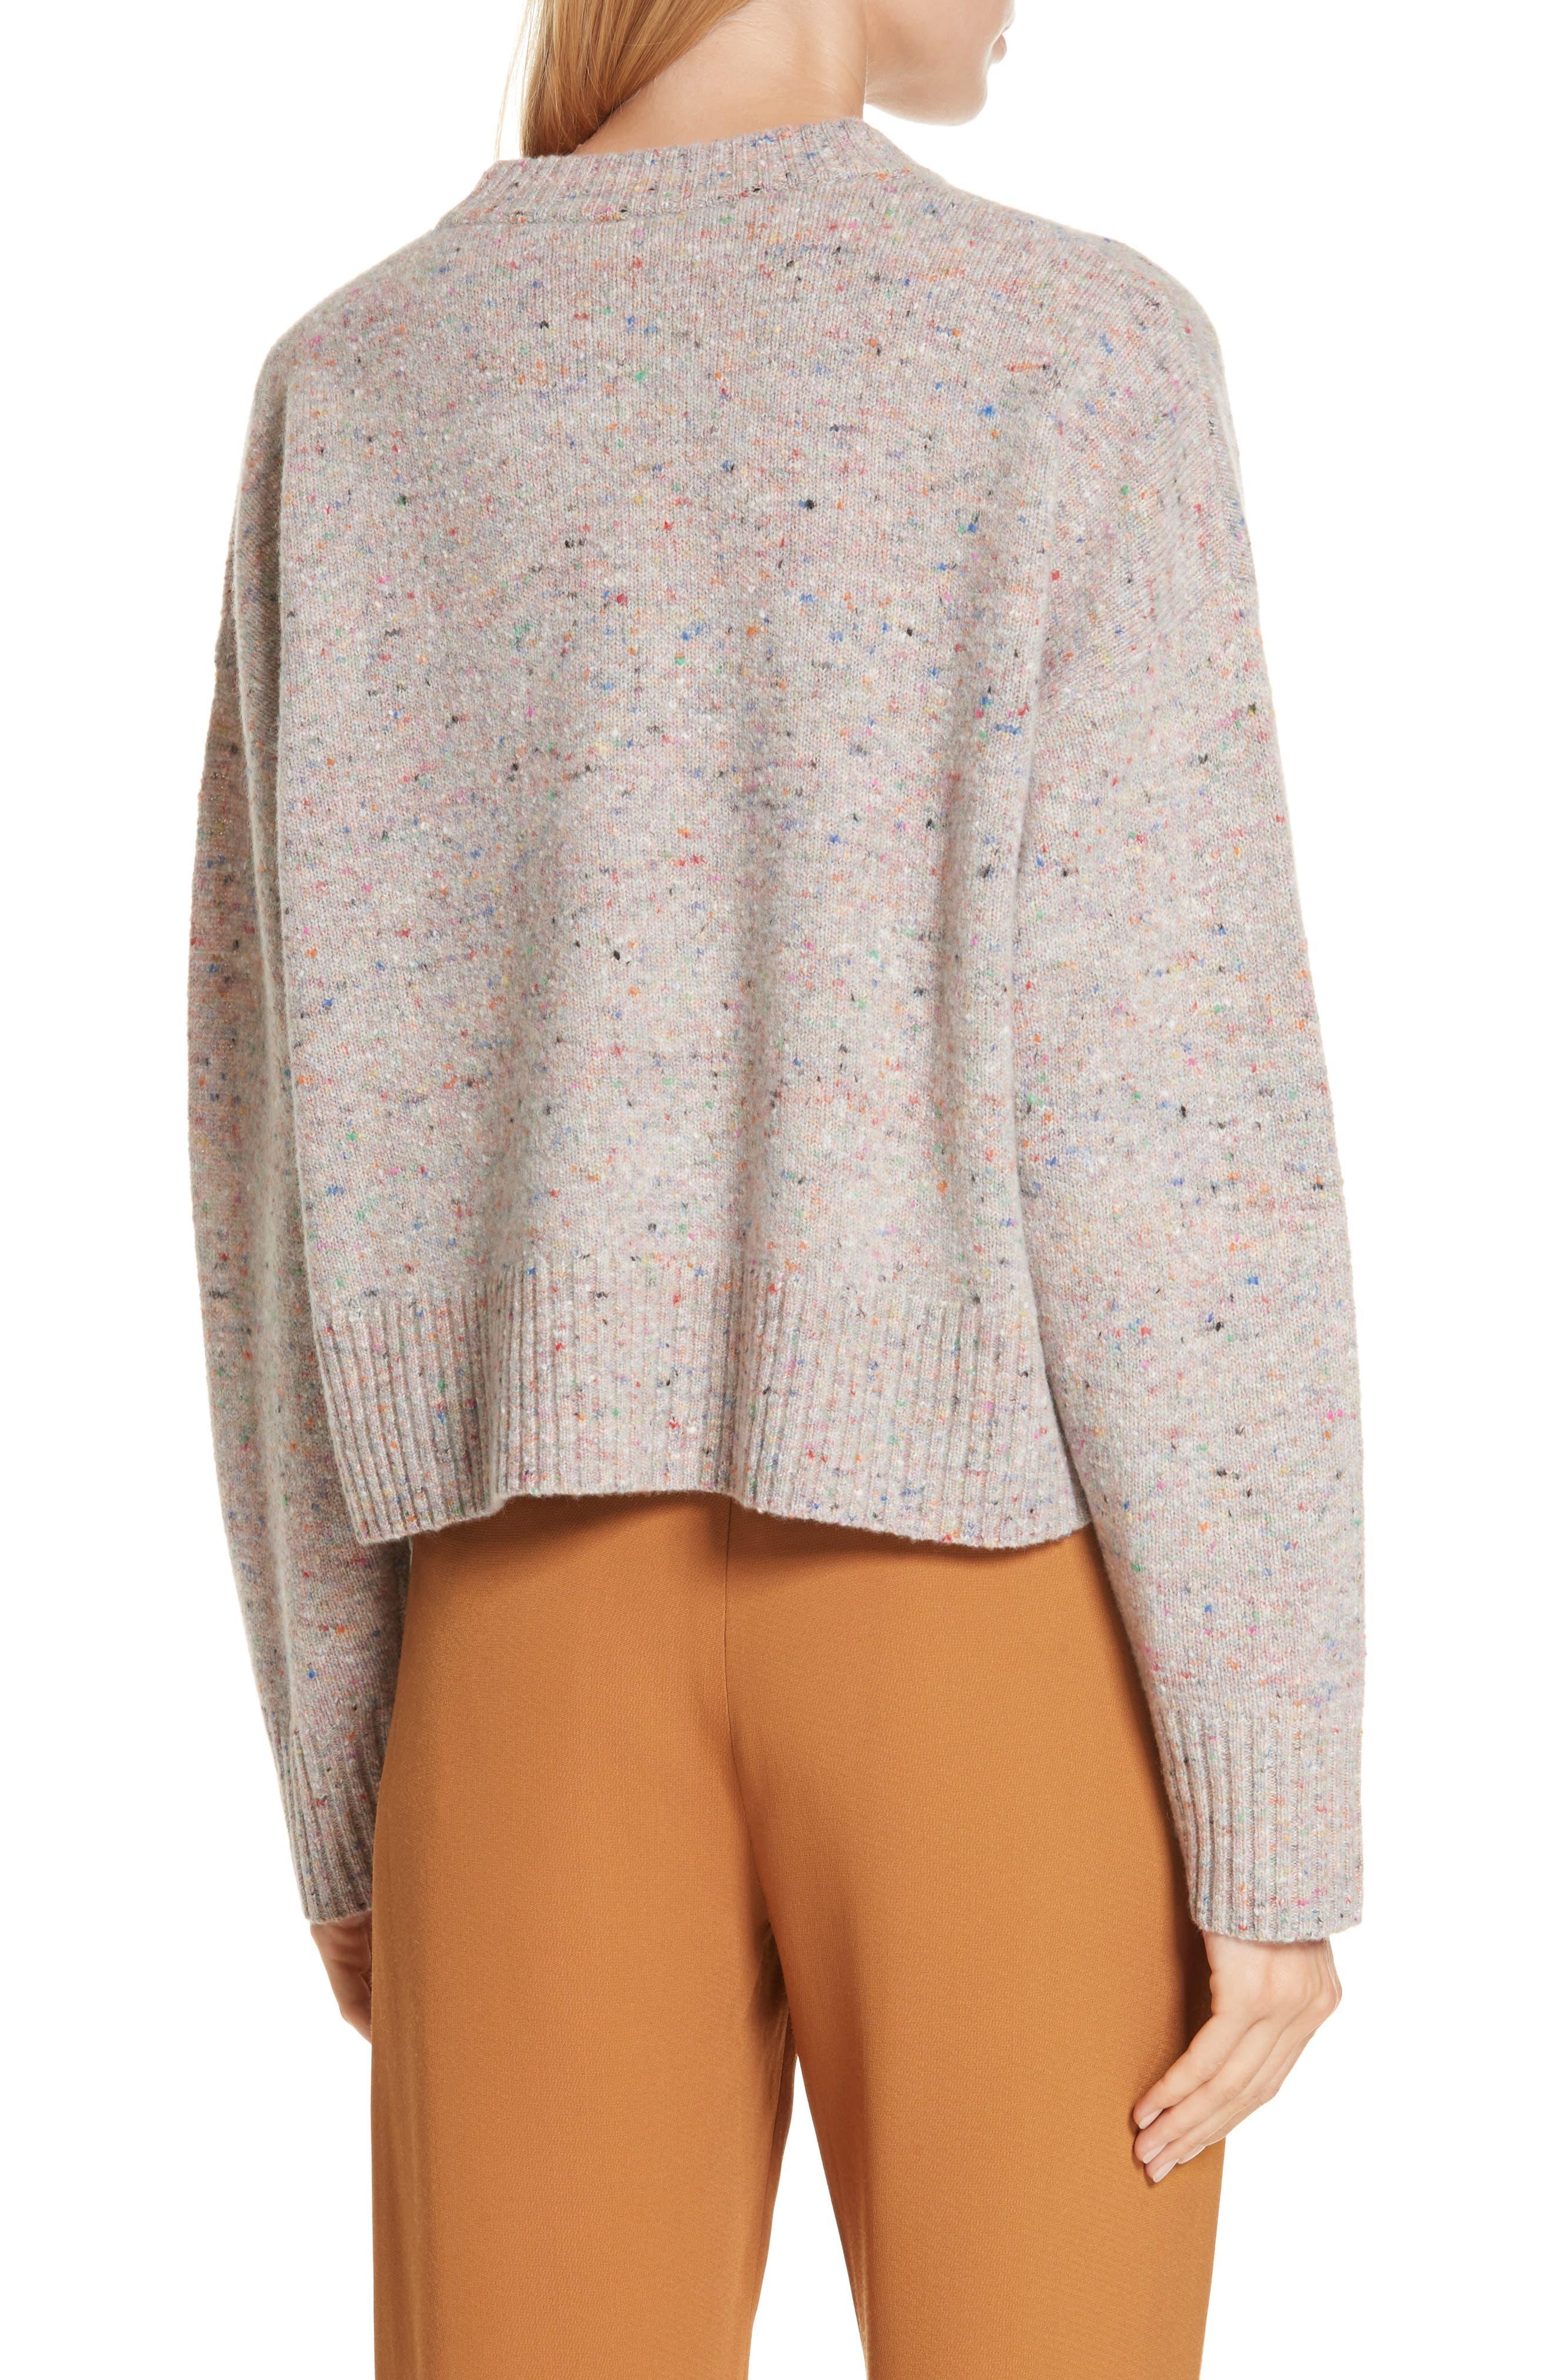 Emmeline Lambswool & Cashmere Blend Sweater,                             Alternate thumbnail 2, color,                             MULTICOLOR